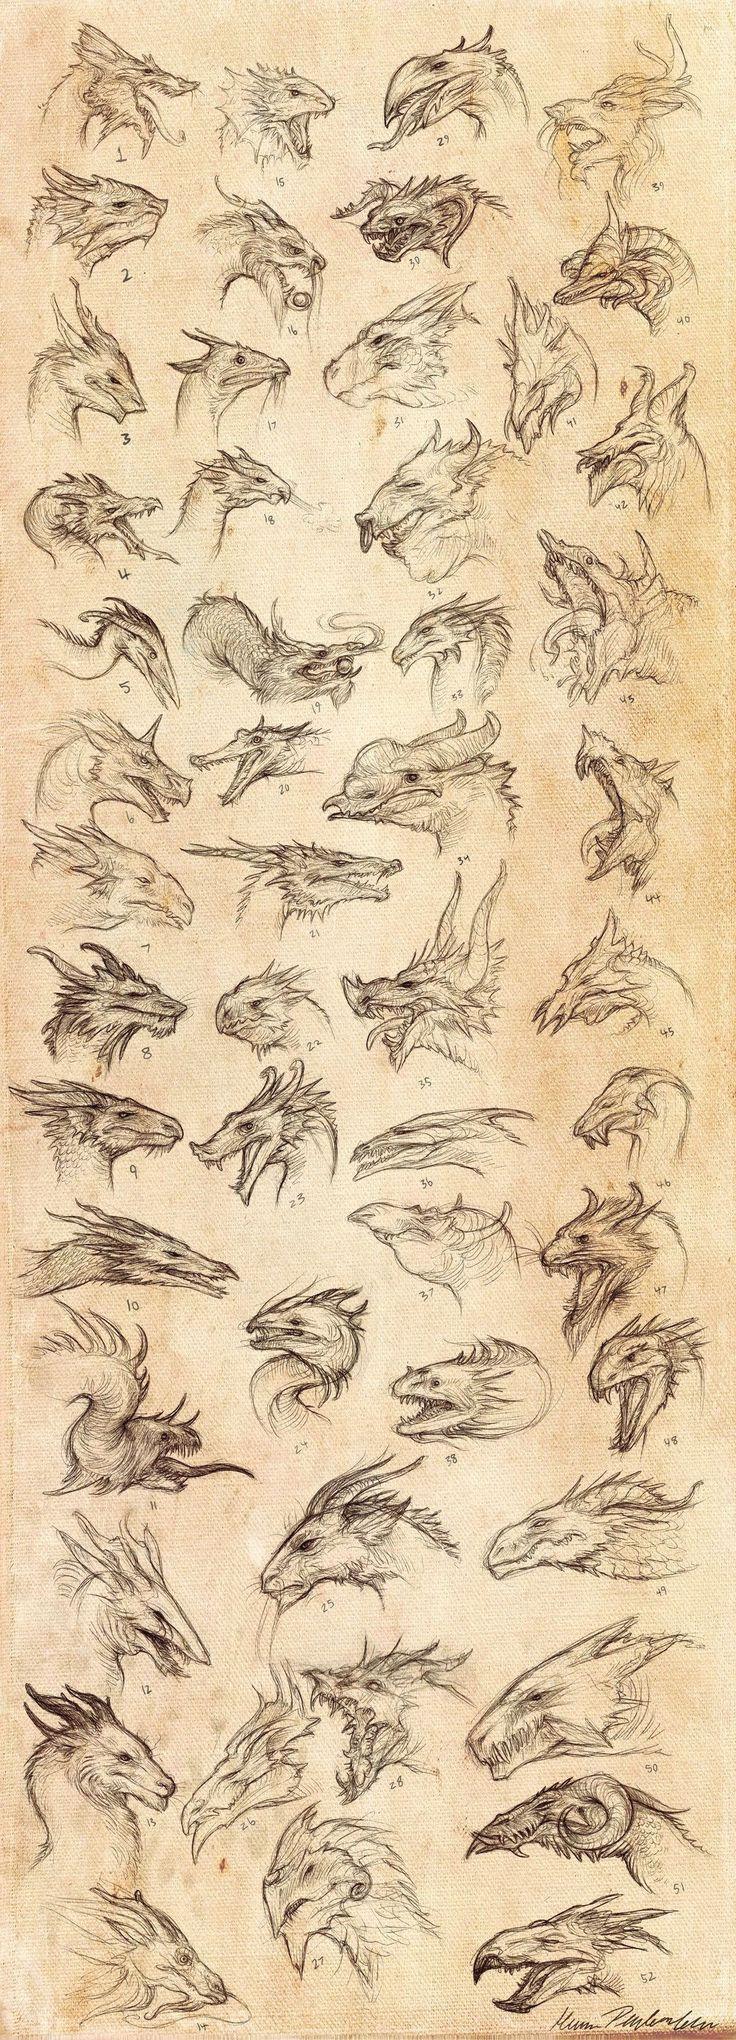 Dragon faces pencil black and white